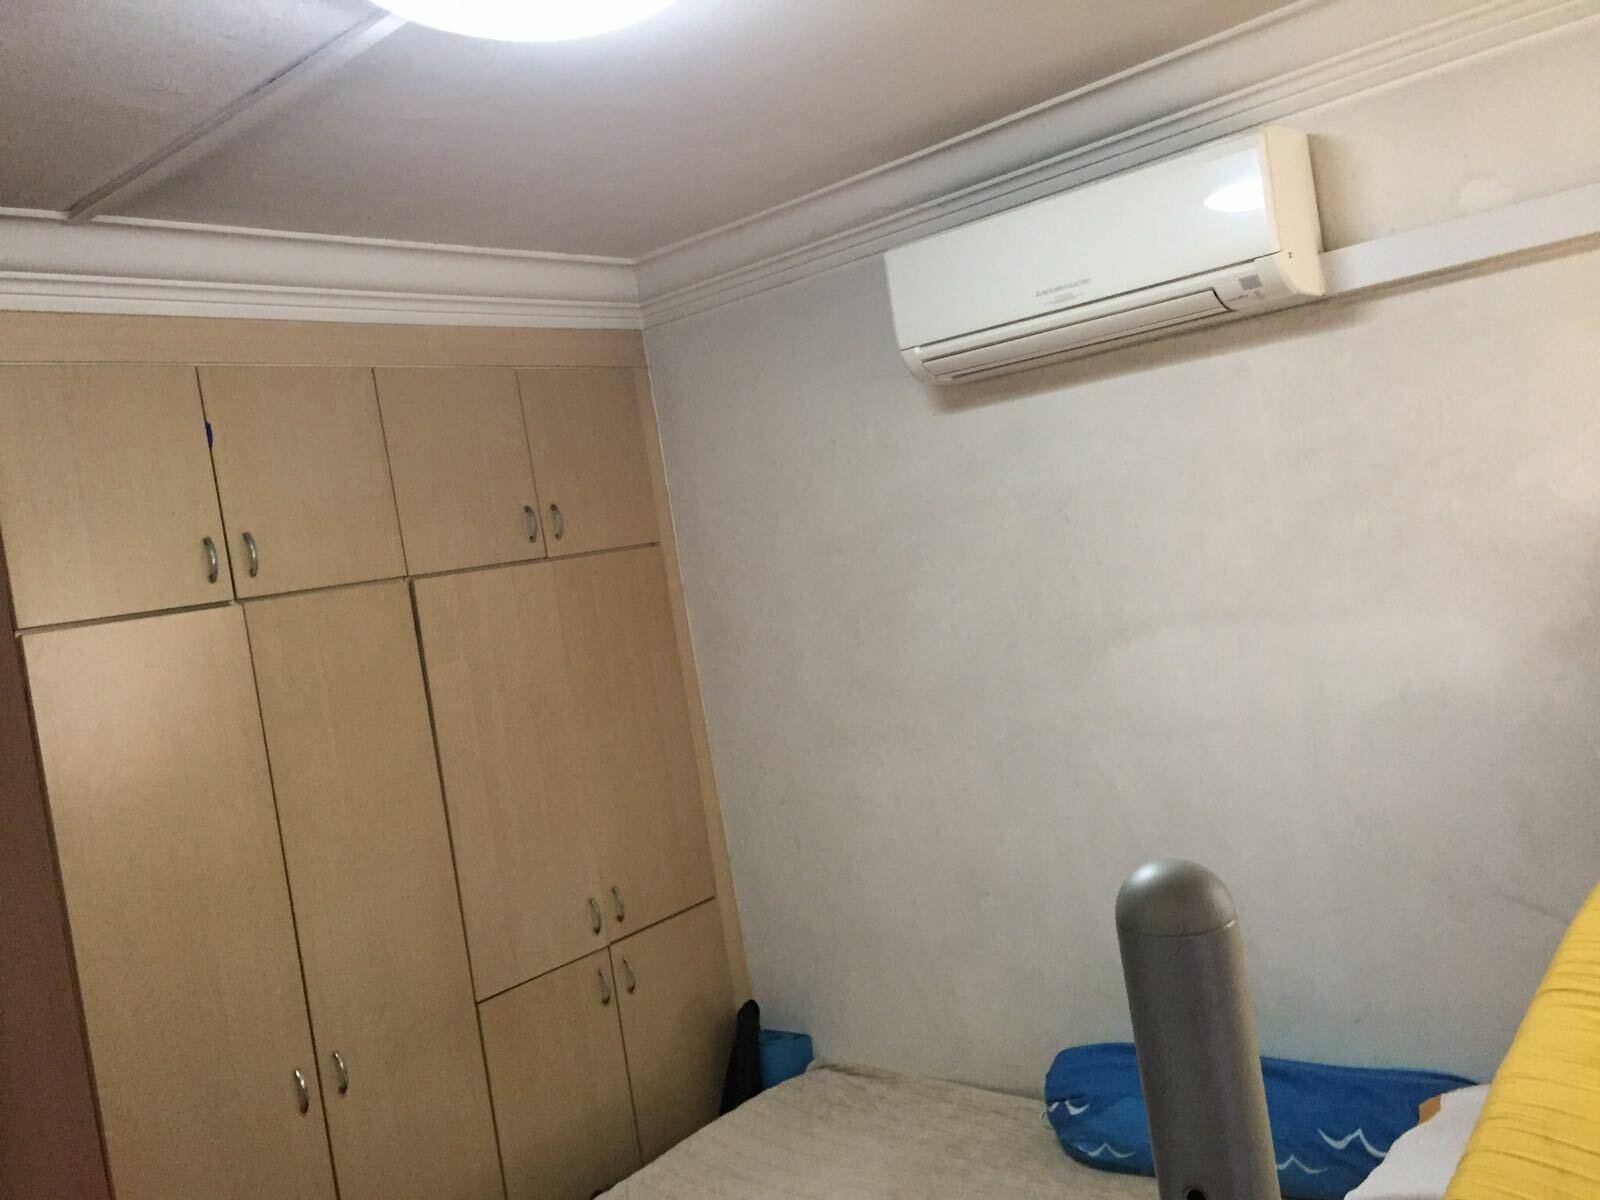 630 Ang Mo Kio Avenue 4 630 Ang Mo Kio Avenue 4 2 Bedrooms 731 Sqft Hdb Flats For Rent By